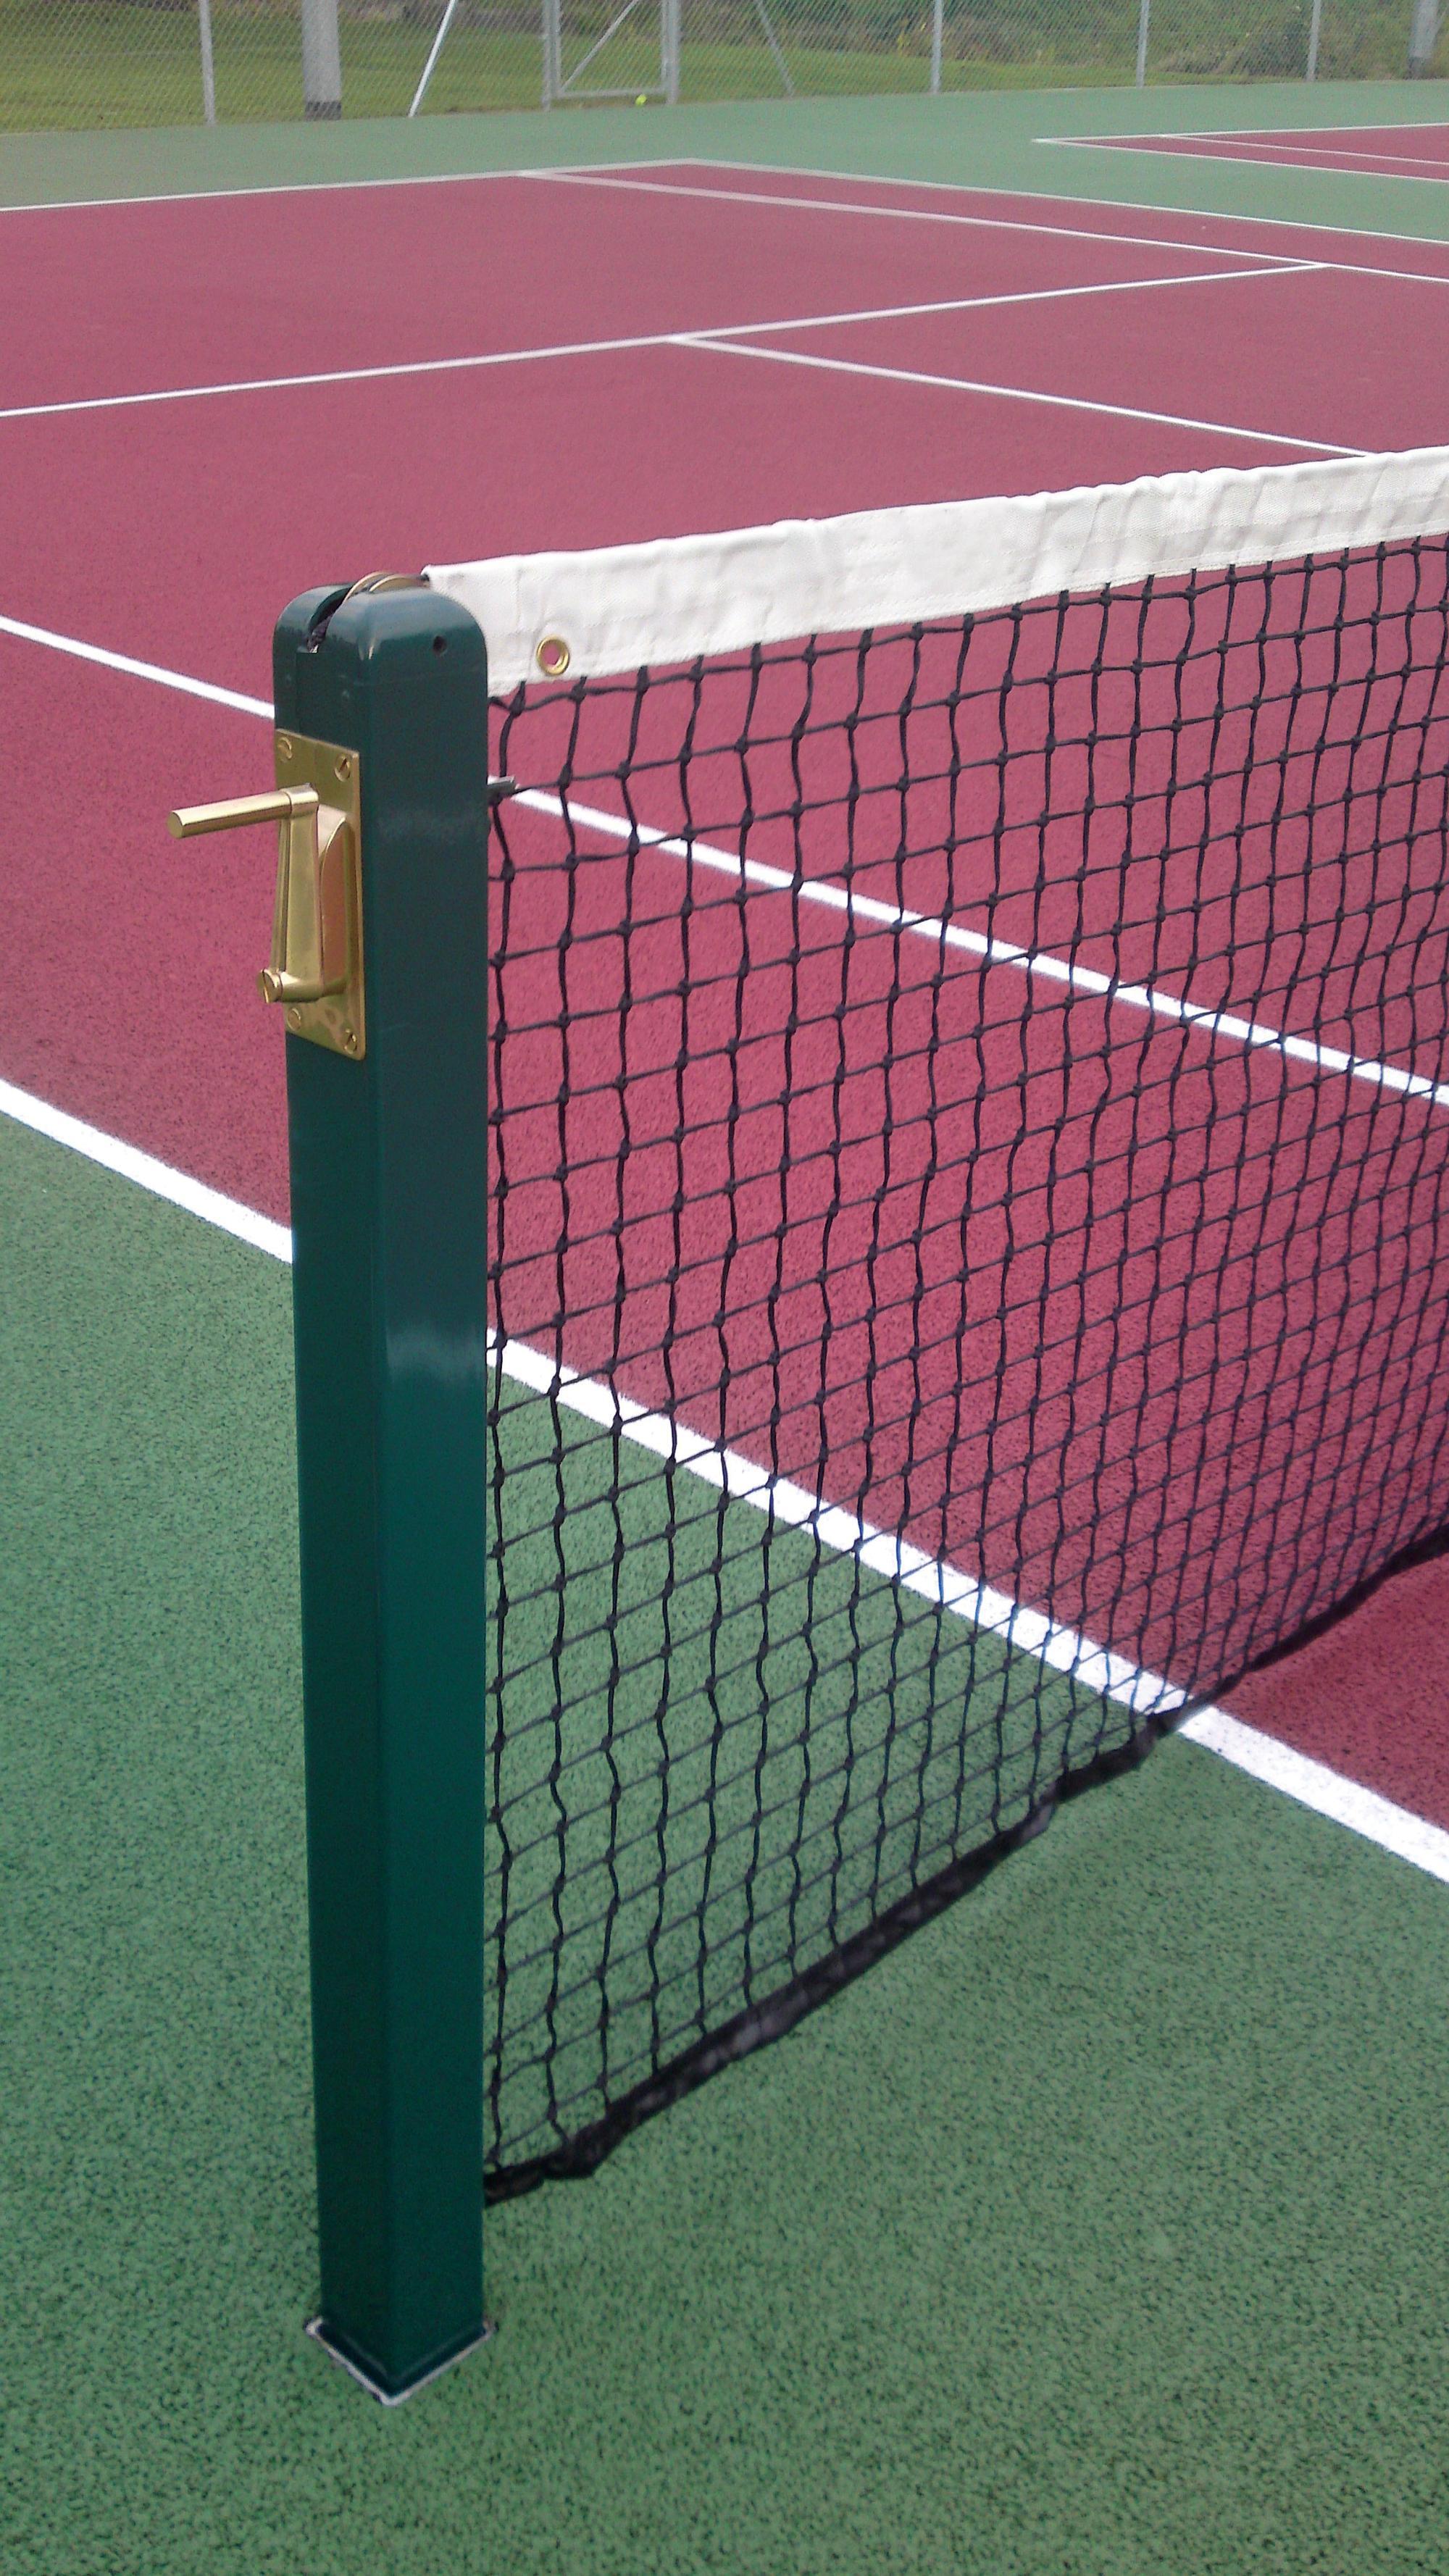 Socketed Mini Tennis Posts